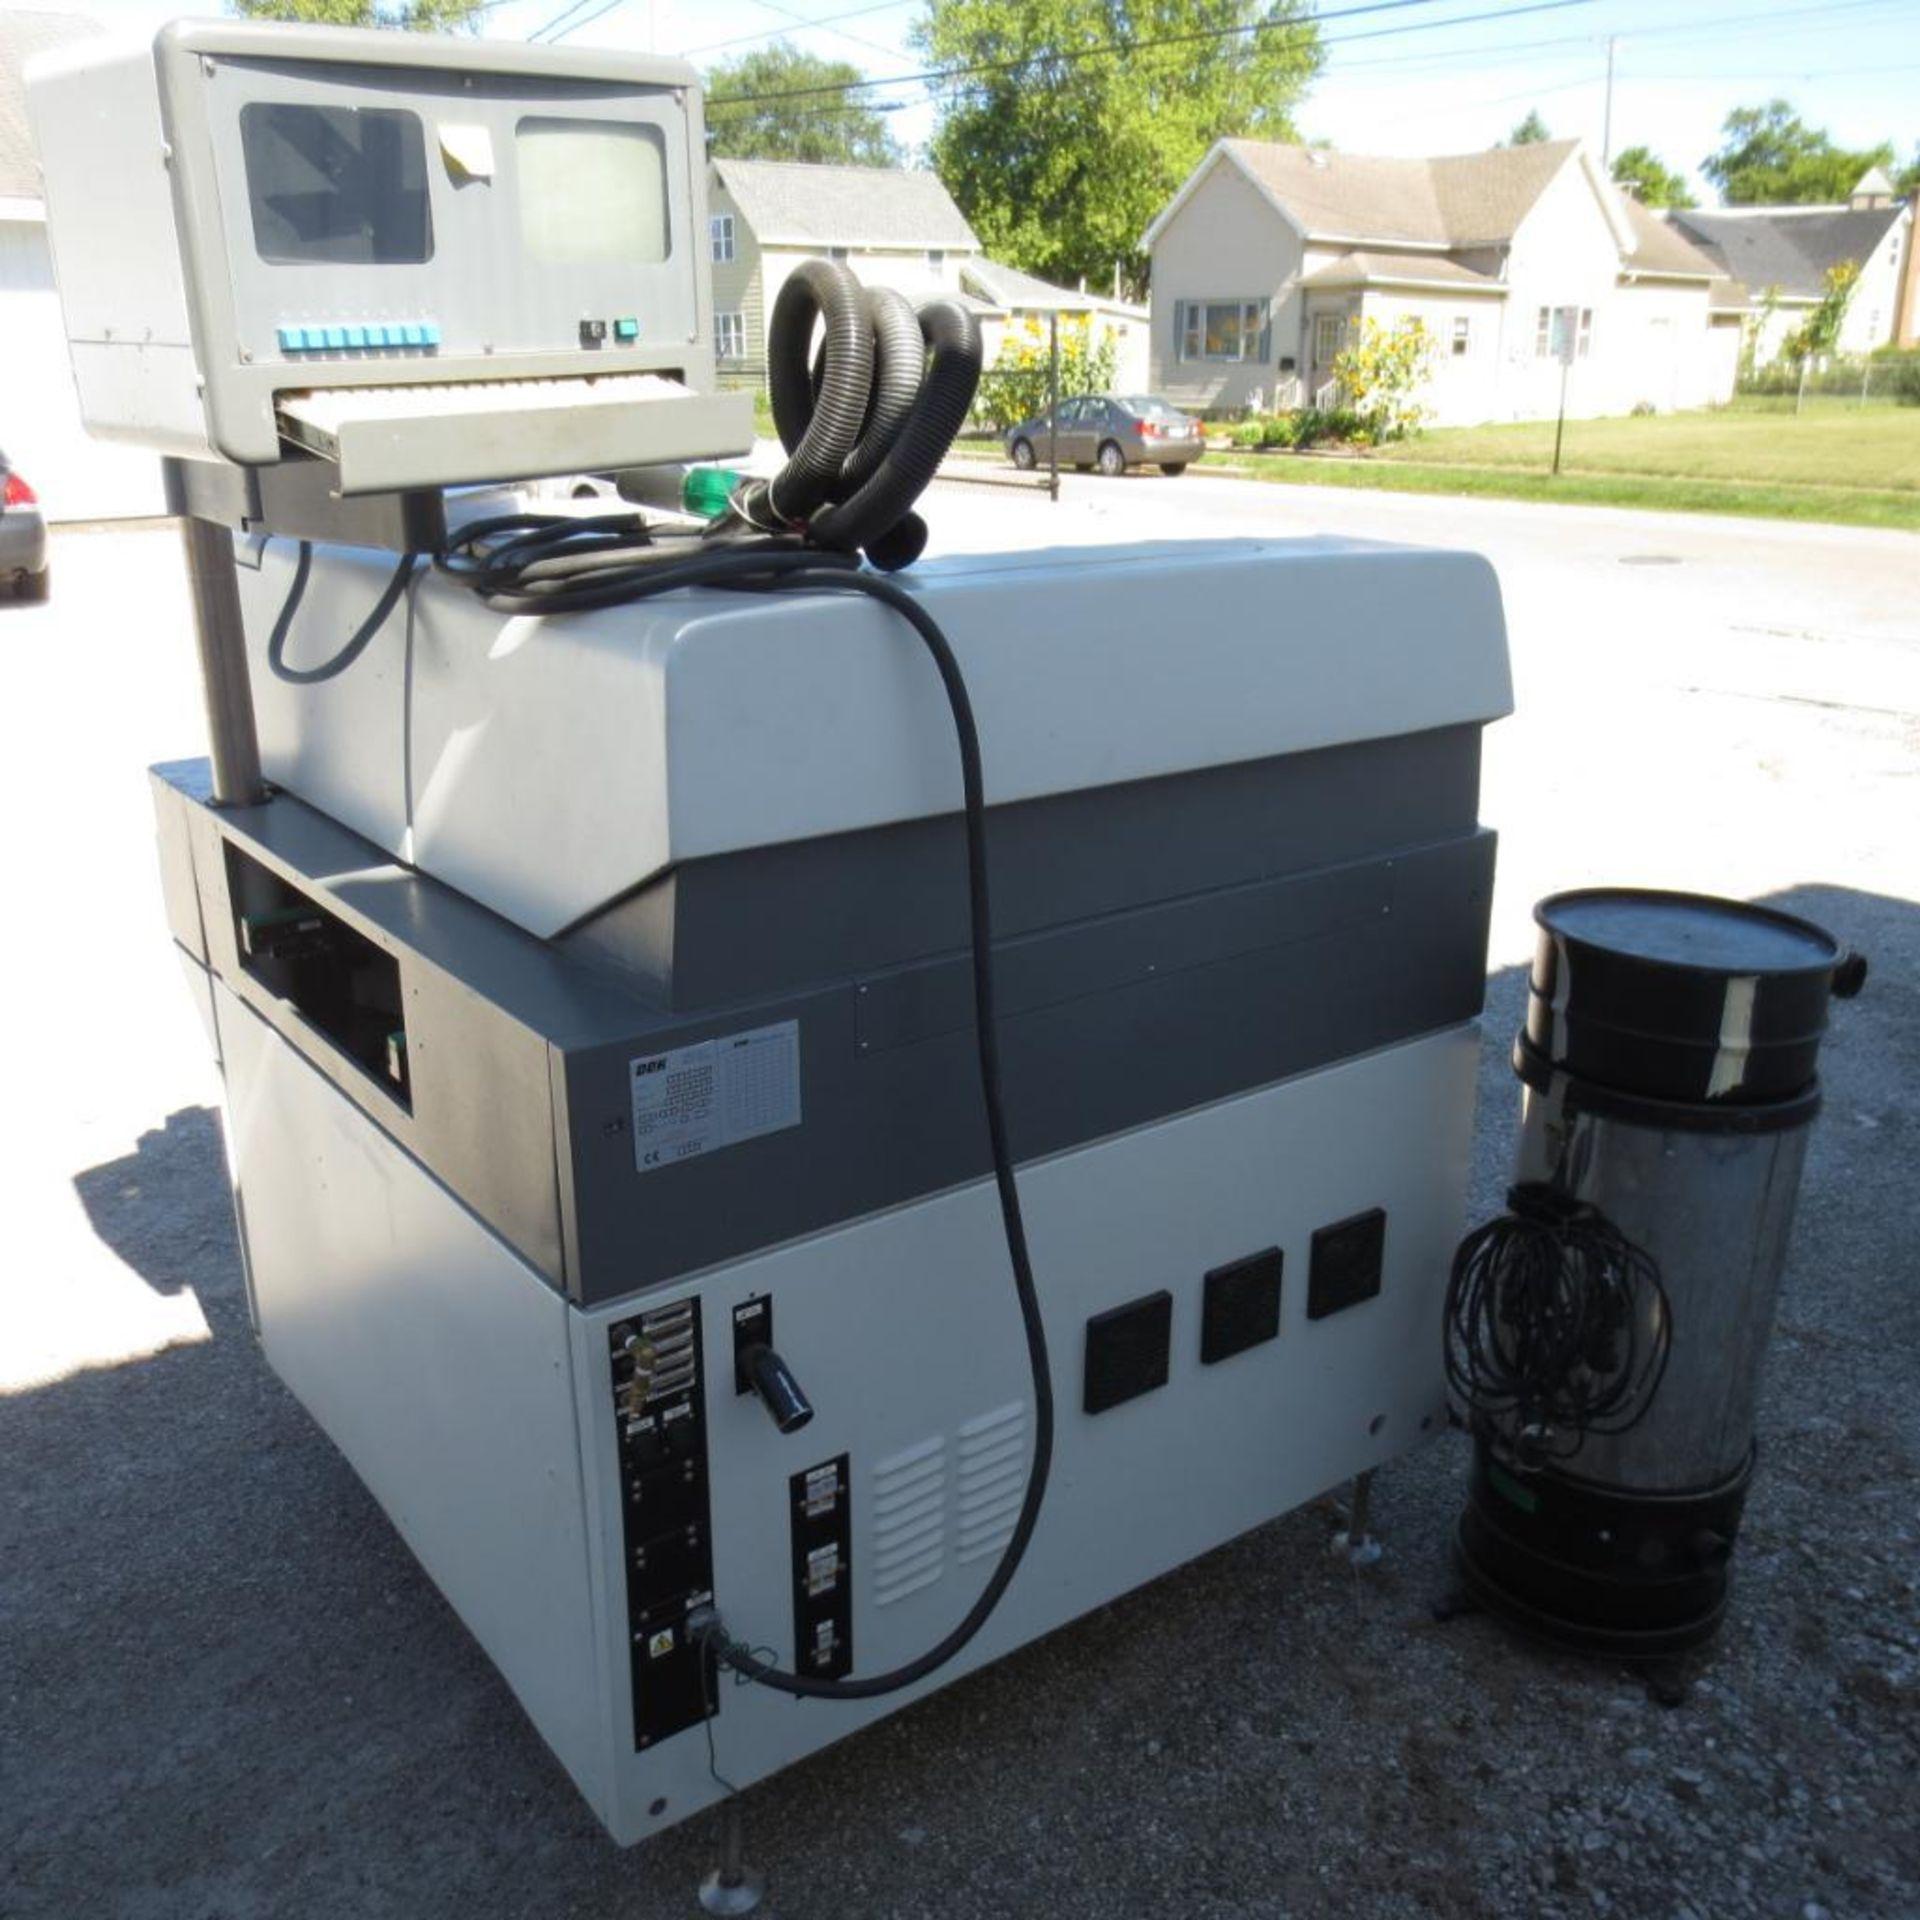 Lot 176 - DEK Screen Printer, Year 2000, Model 235 GSX, S/N 273490 located at 1509 Woodlawn Ave Logansport, IN